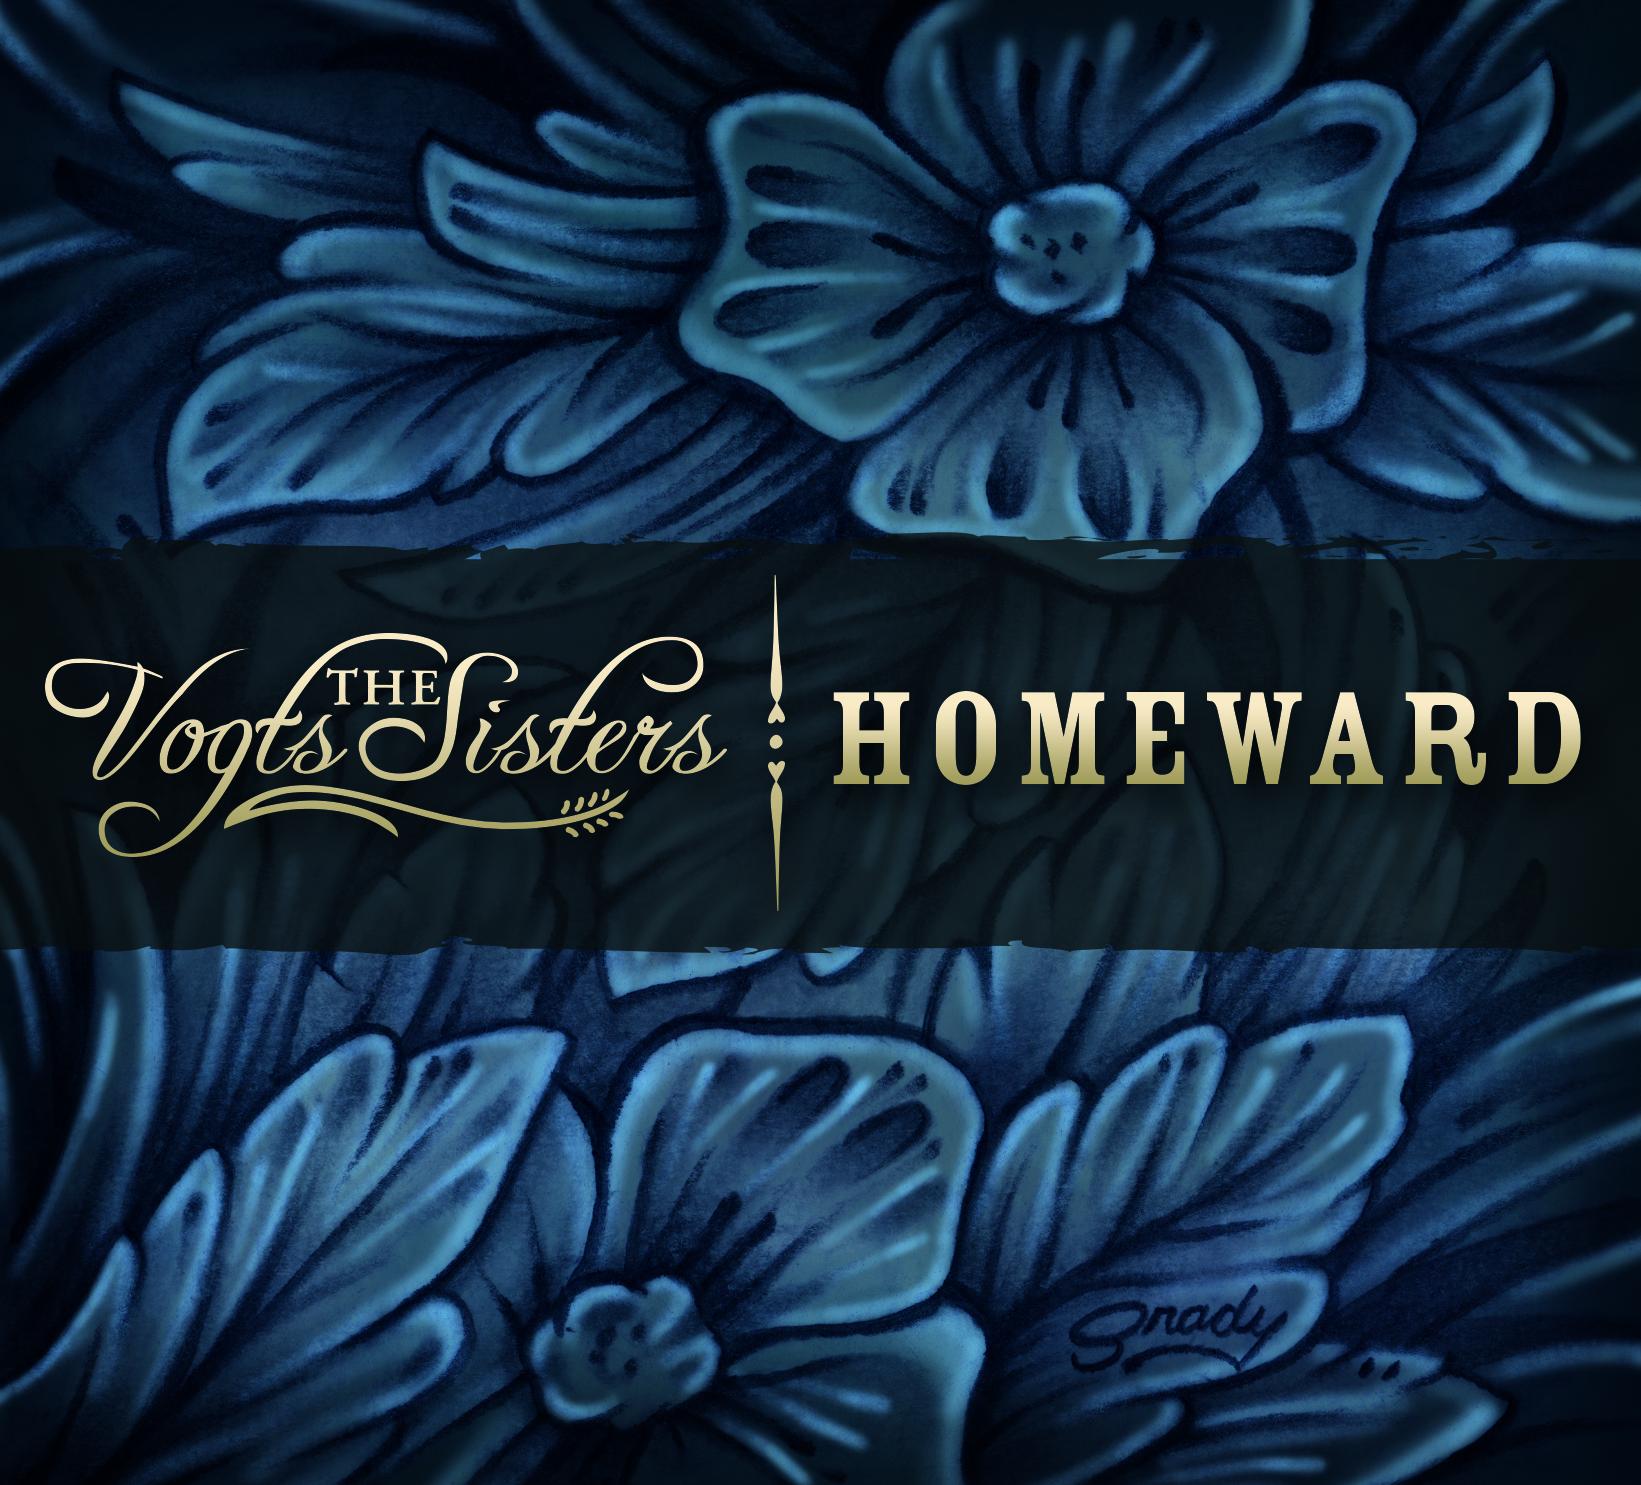 The Vogts Sisters - Homeward